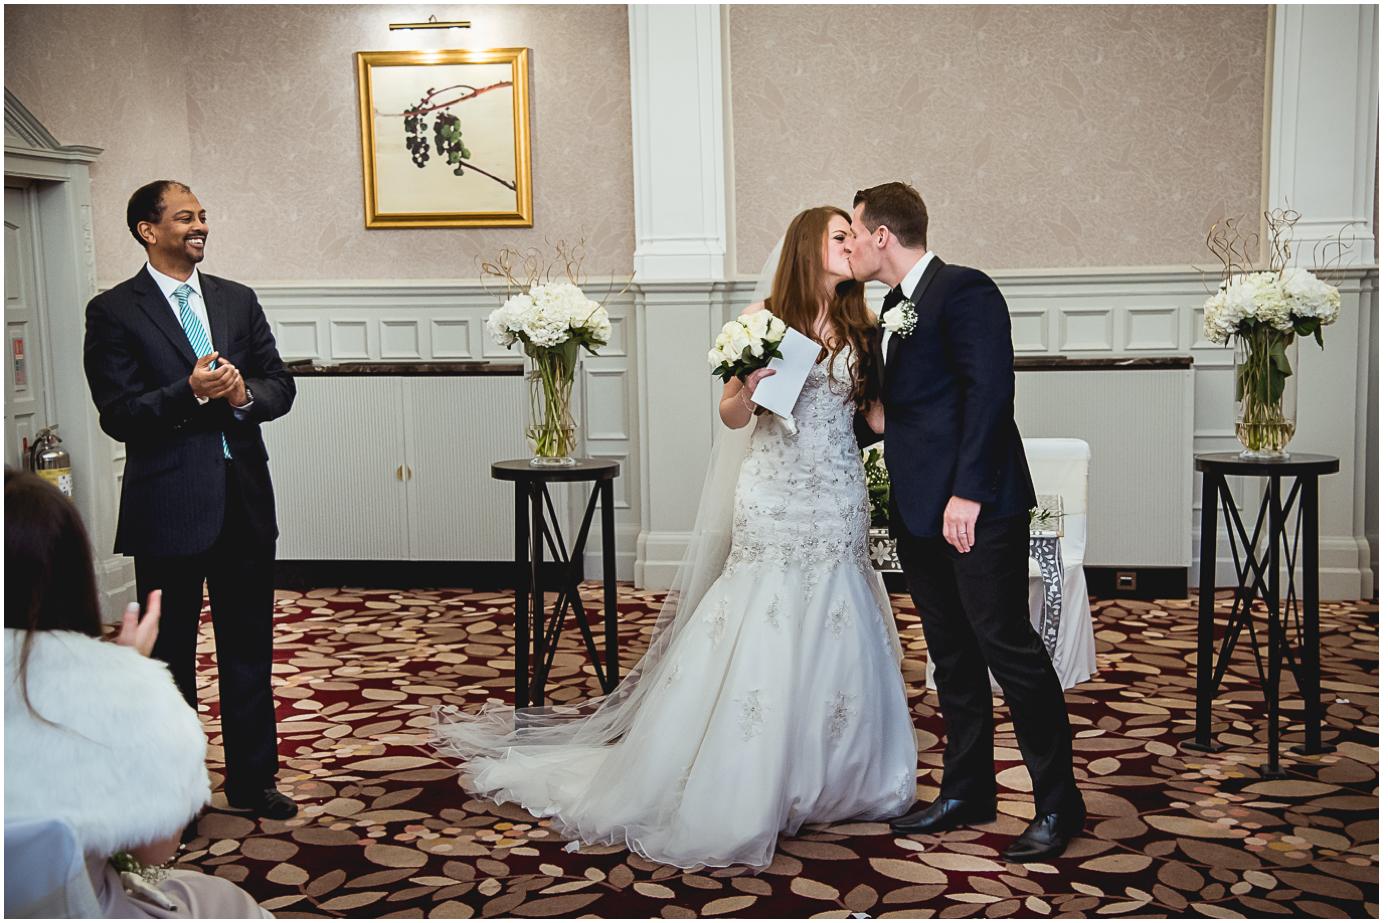 39 - Esmat and Angus - St. Ermin's Hotel London wedding photographer